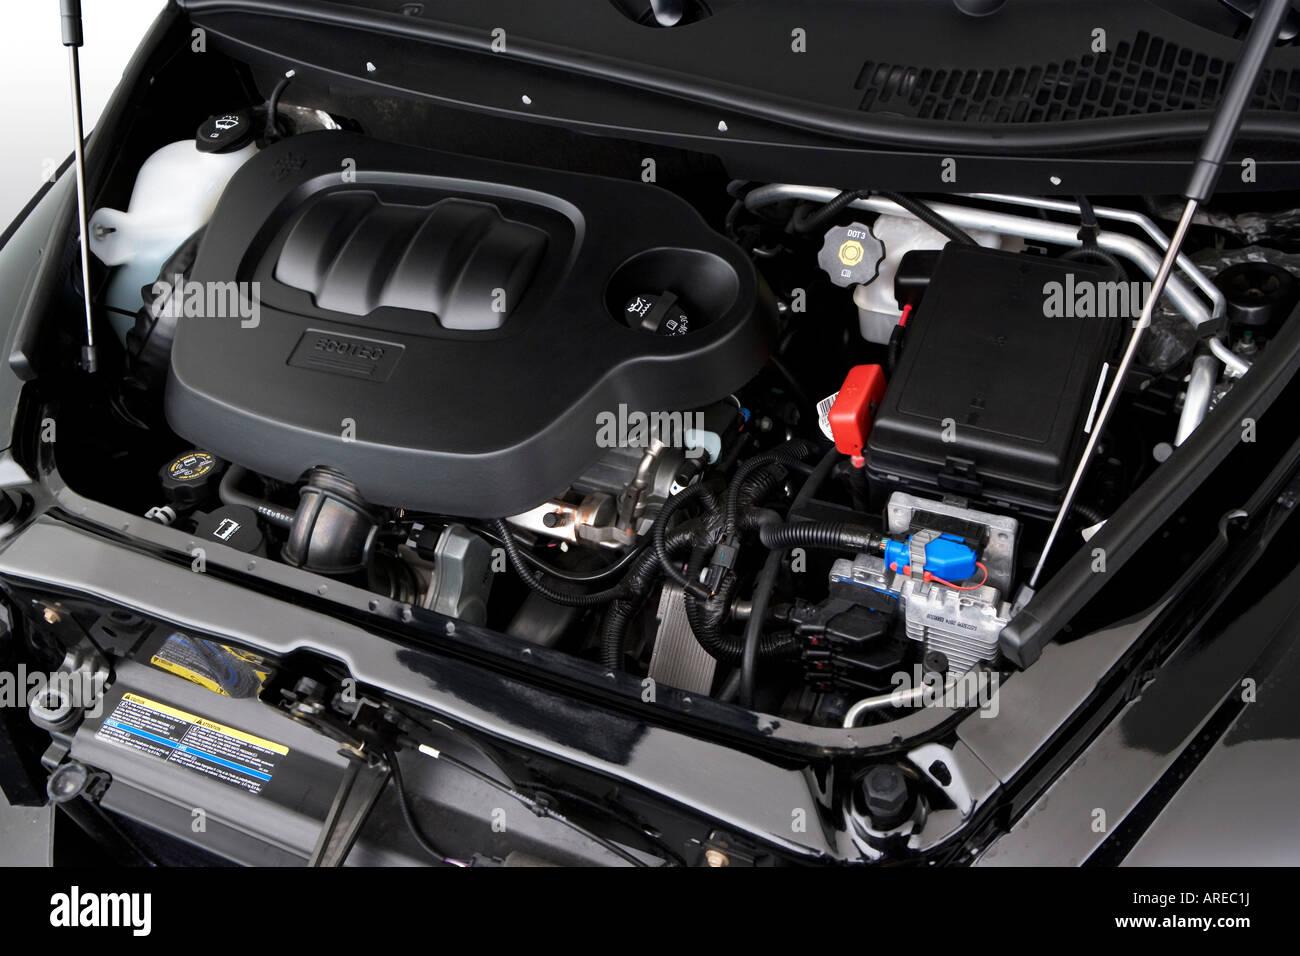 2006 Chevrolet Hhr 2lt In Black Engine Stock Photo Alamy